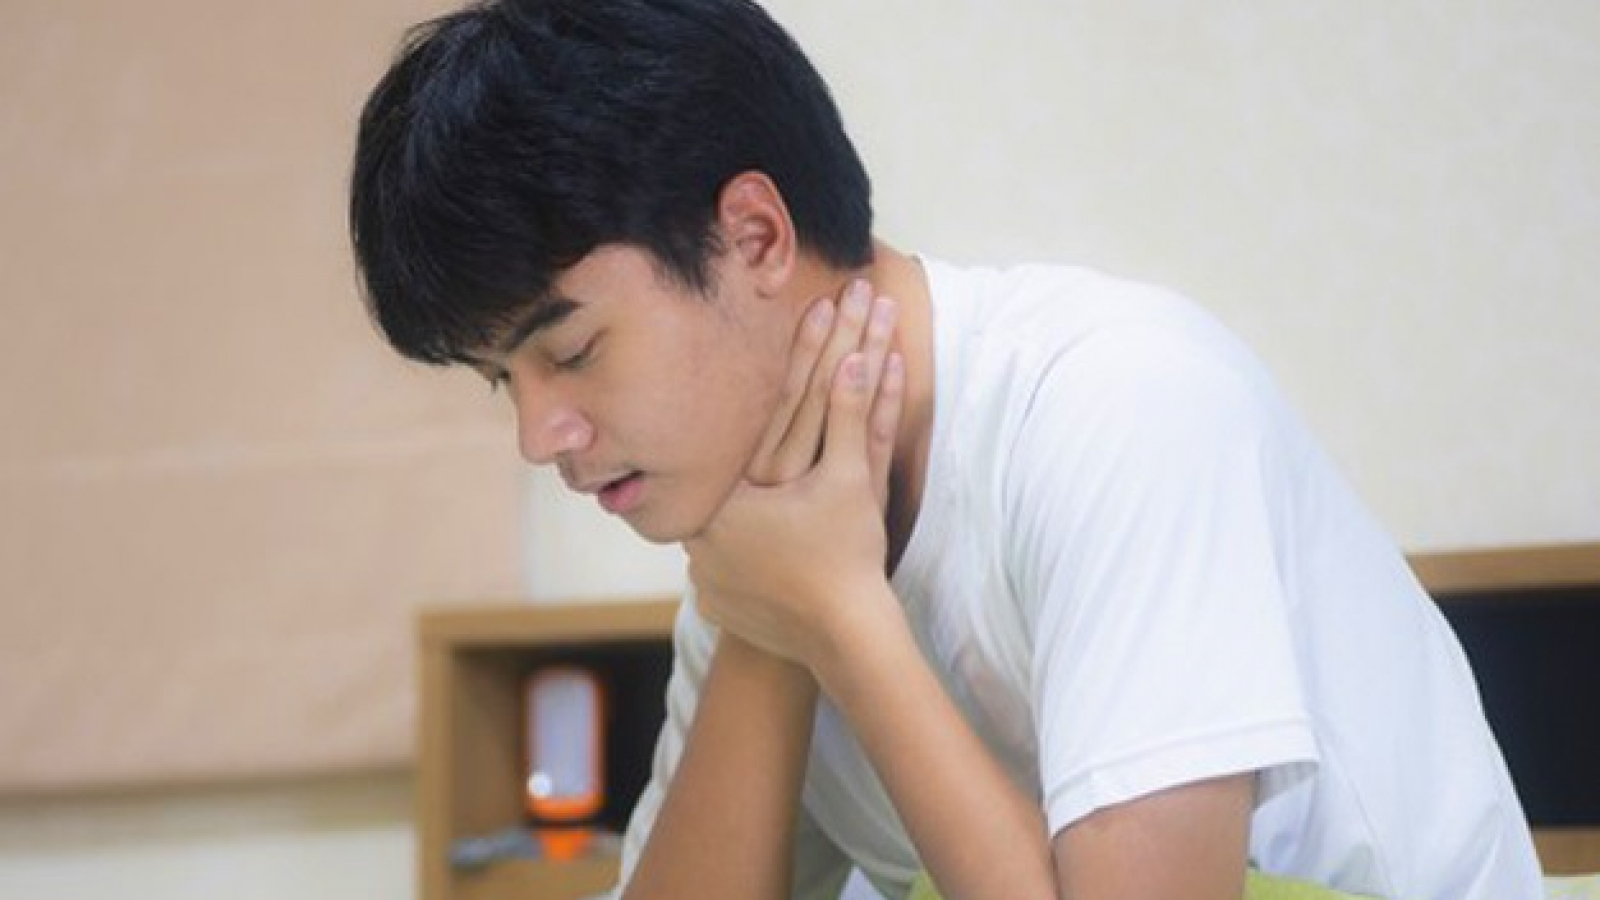 Sakit Tenggorokan Apa Termasuk Dalam Gejala COVID-19